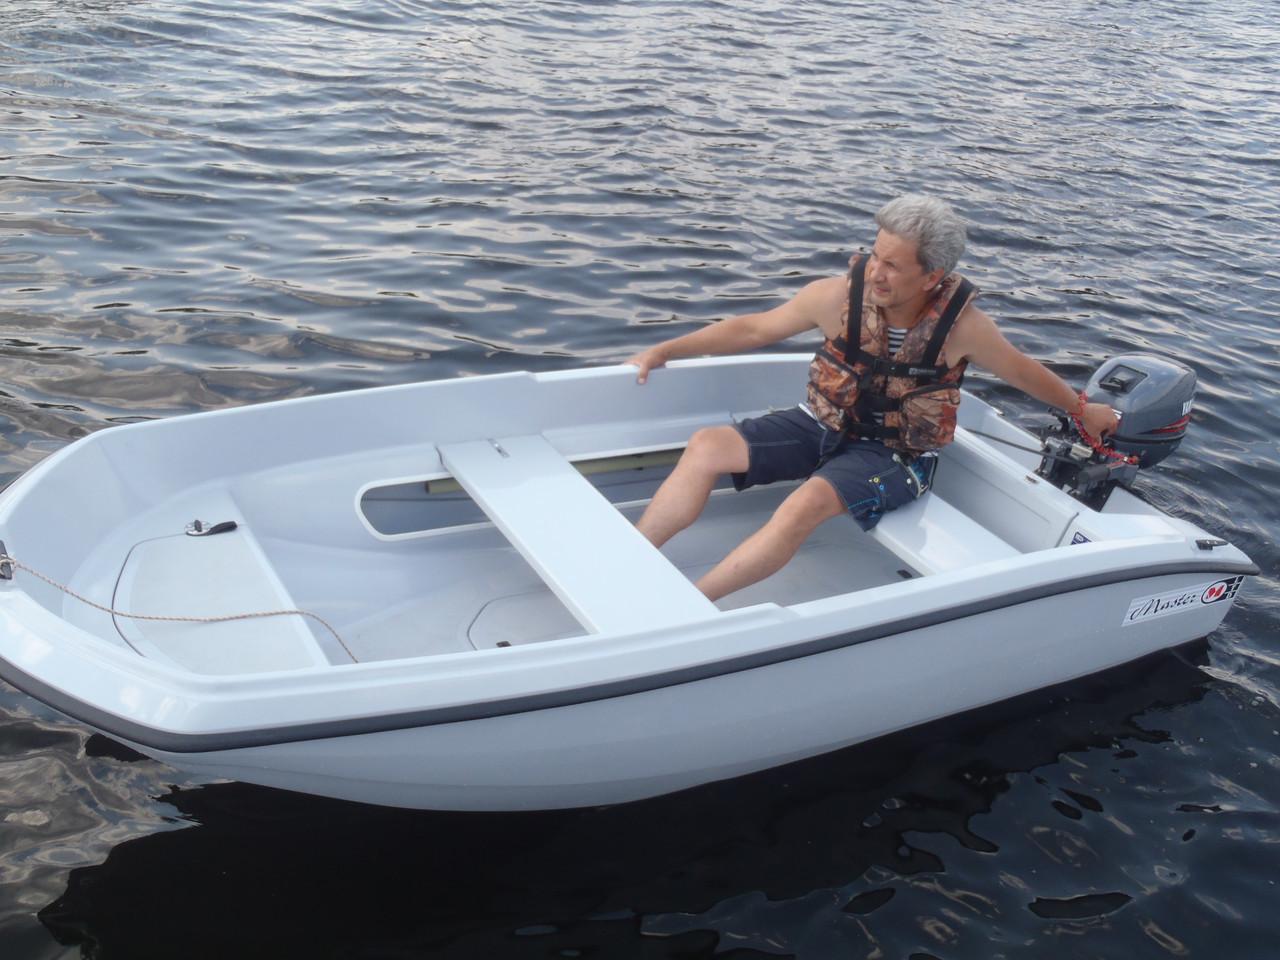 пластиковая лодка мастер цена